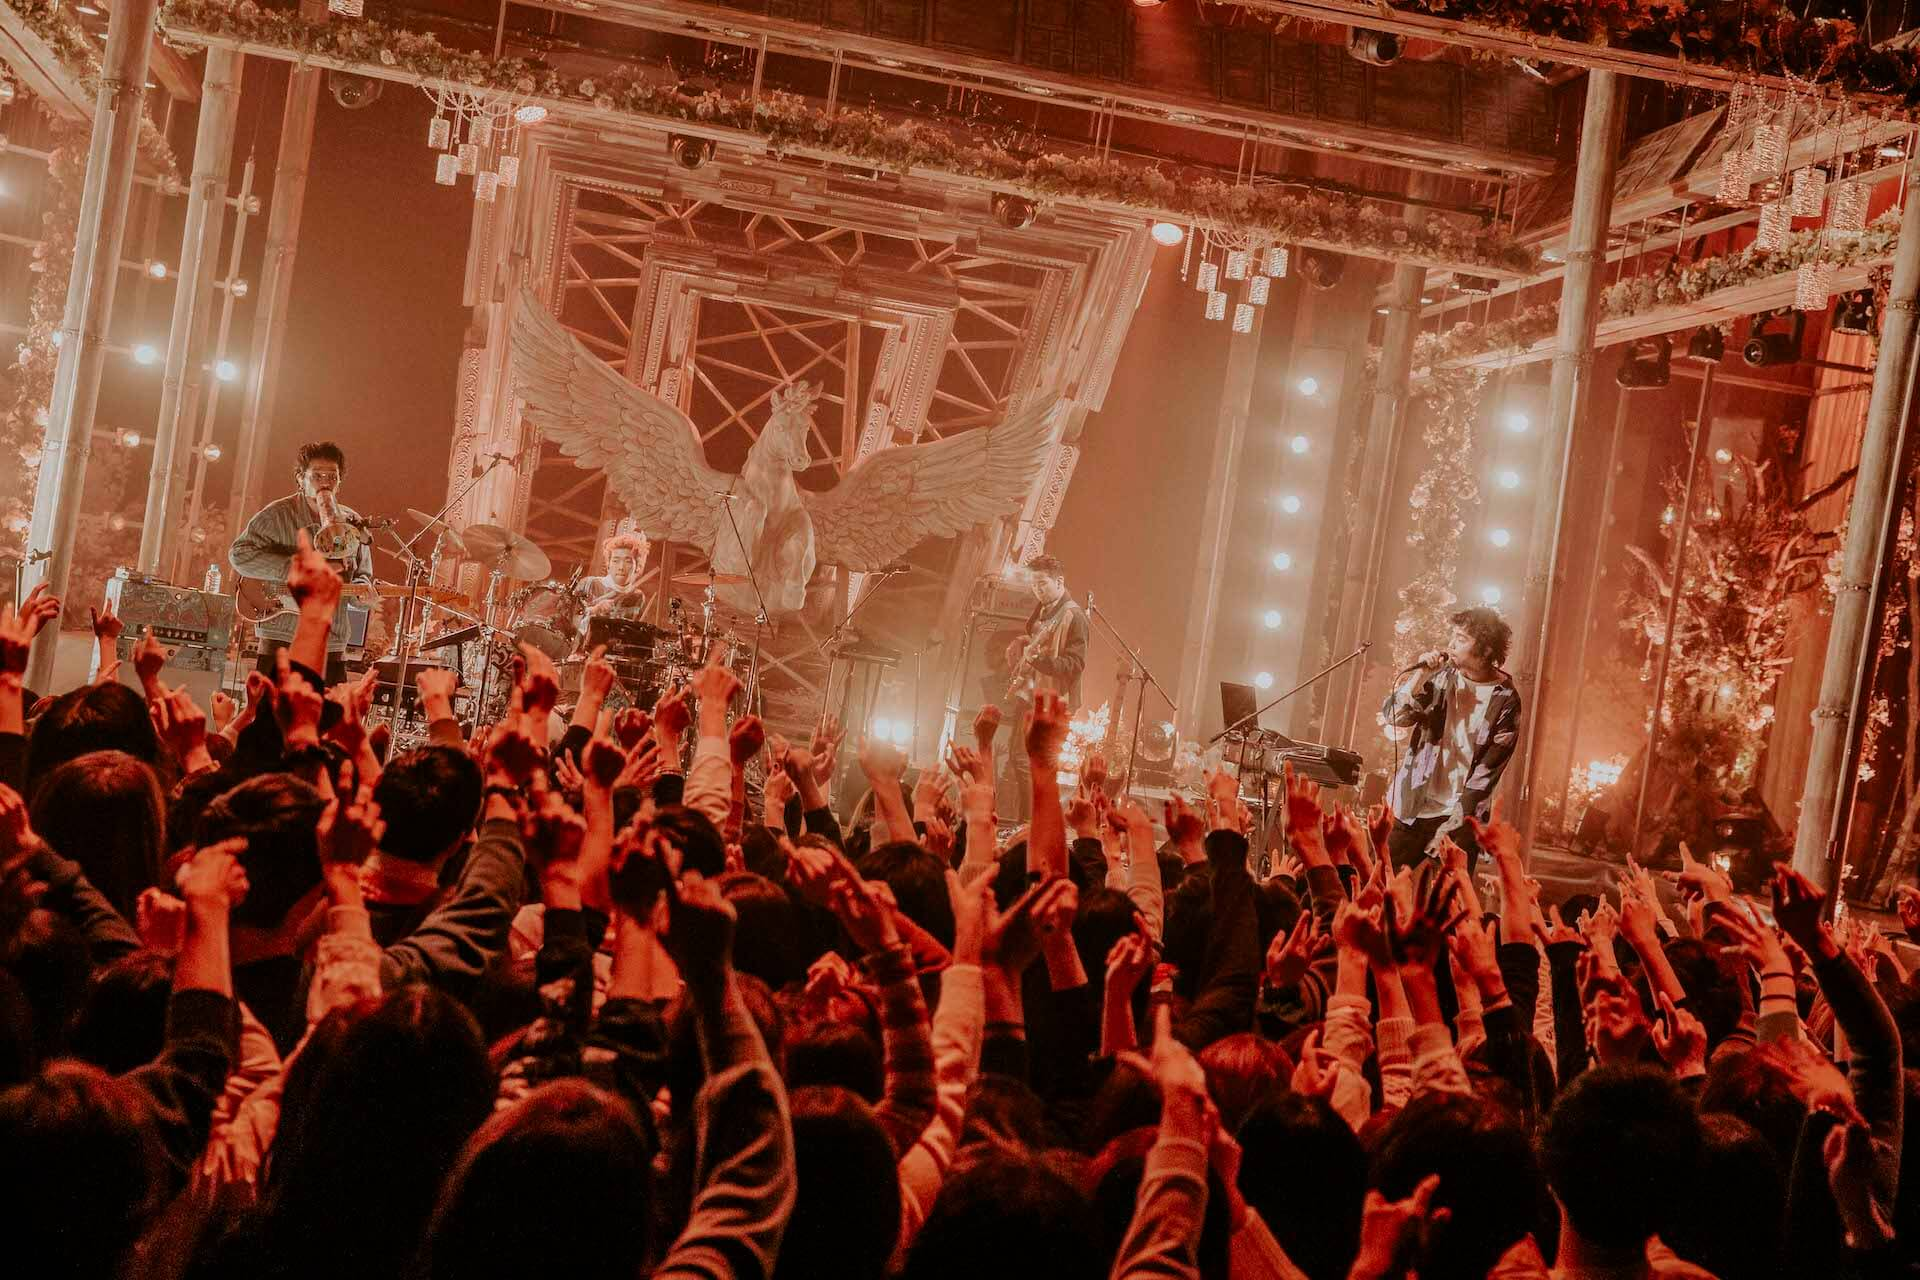 King Gnu「傘」「The hole」を地上波初披露!来週『Love music』特別番組放送決定 music200203_kinggnu_4